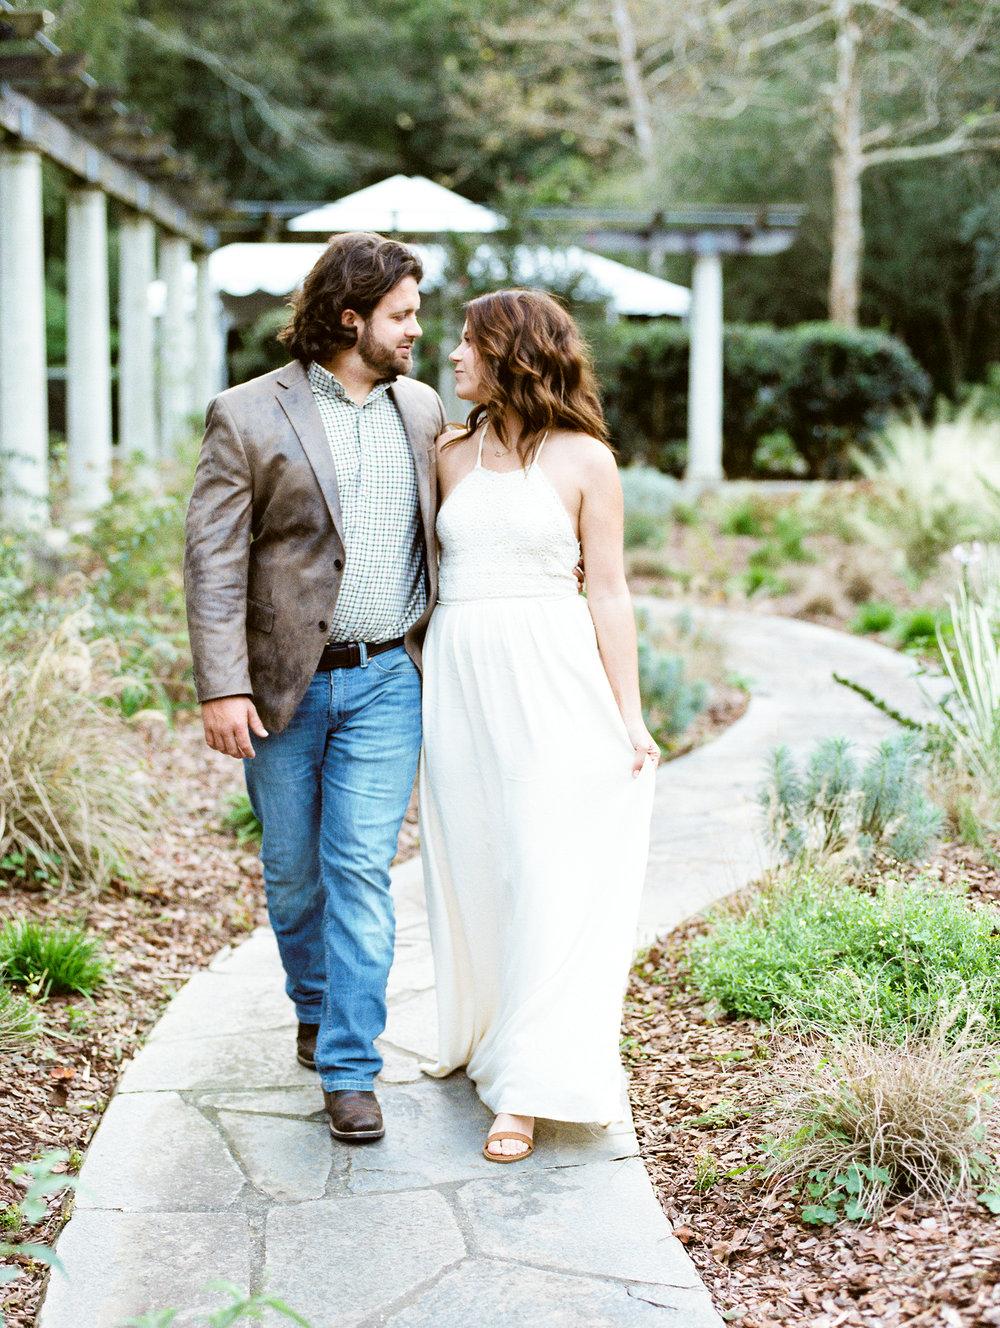 Jenna_Sam_Engagment_Cator_Woolford_Gardens_Atlanta_Georgia_Fallen_Photography-70.JPG